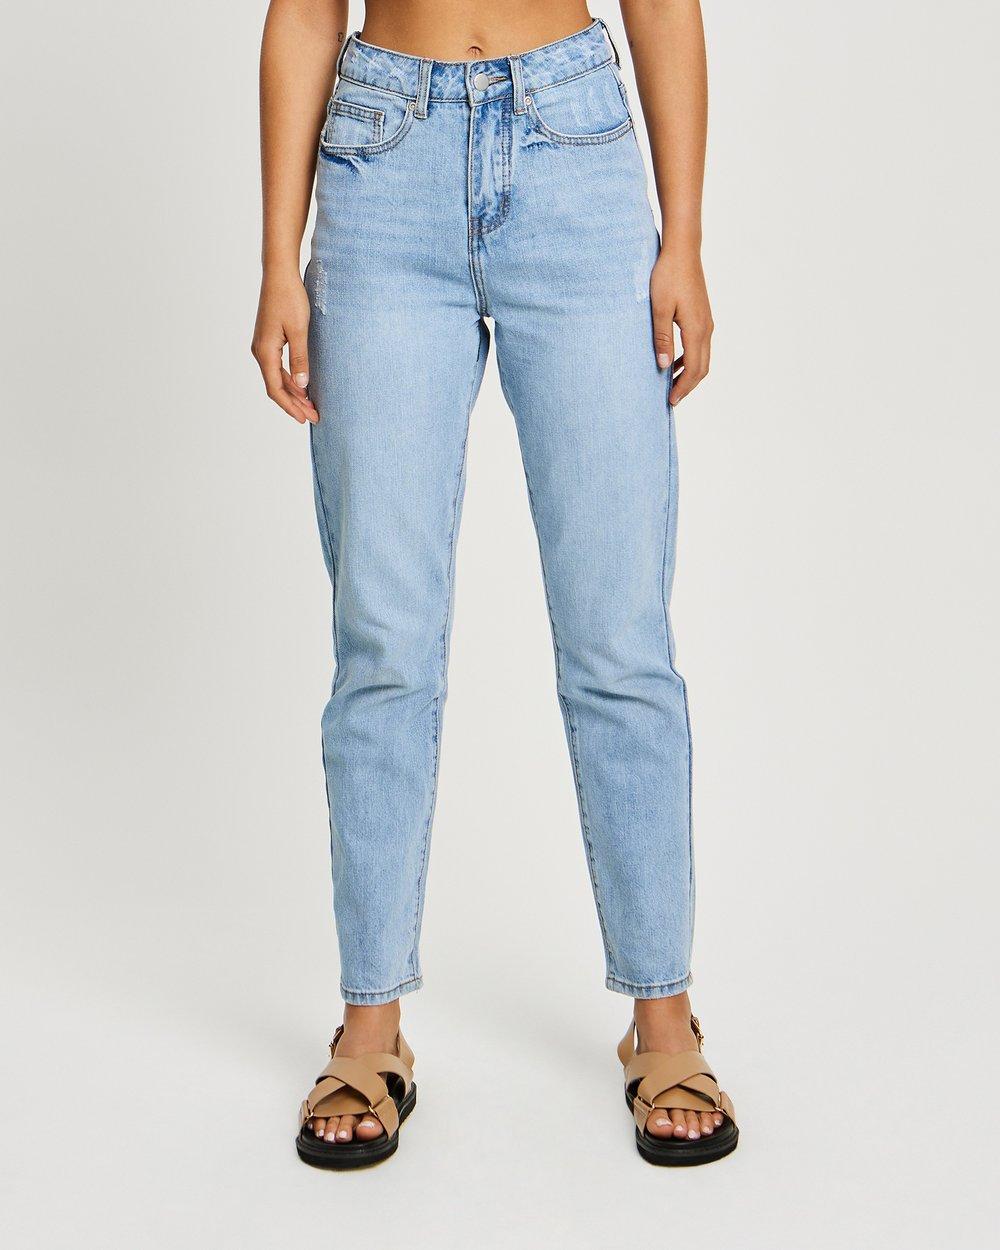 new product 3d4ad 28b6f Radical Mum Jeans